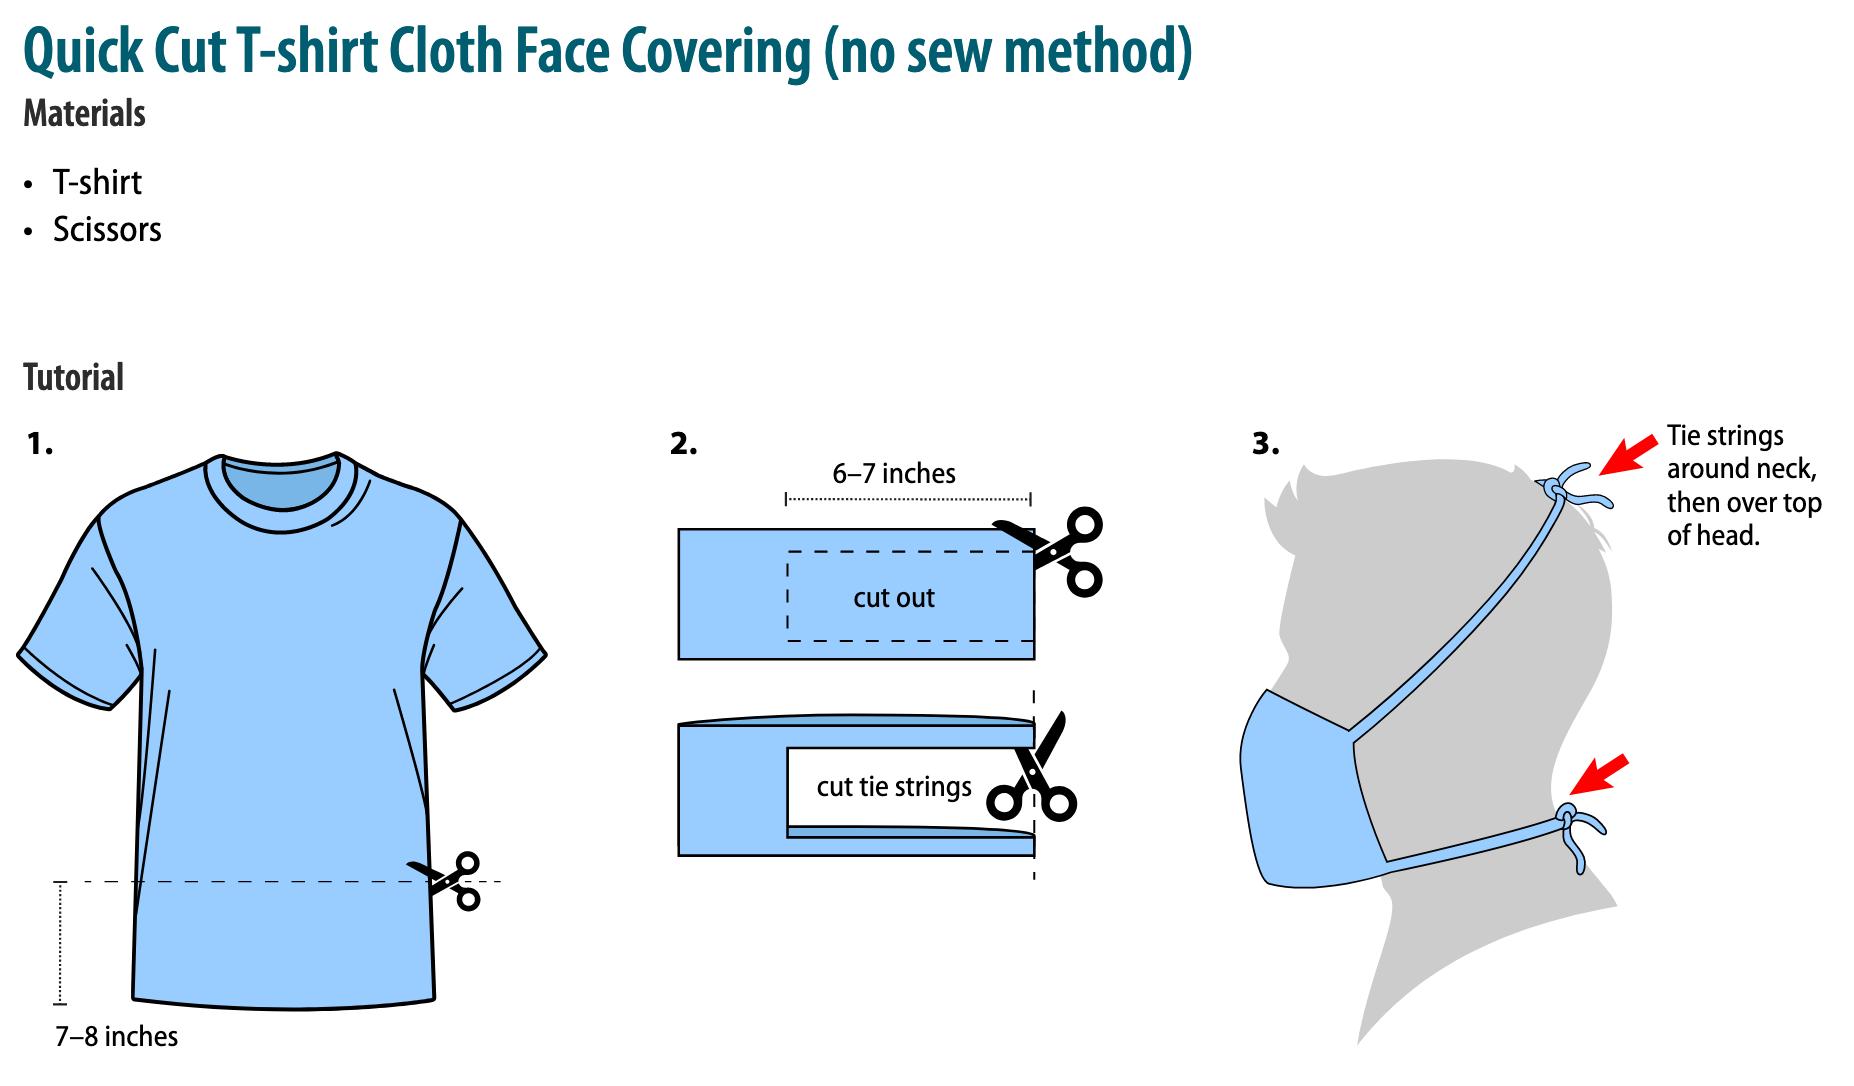 Quick Cut T-shirt Cloth Face Covering (no sew method)